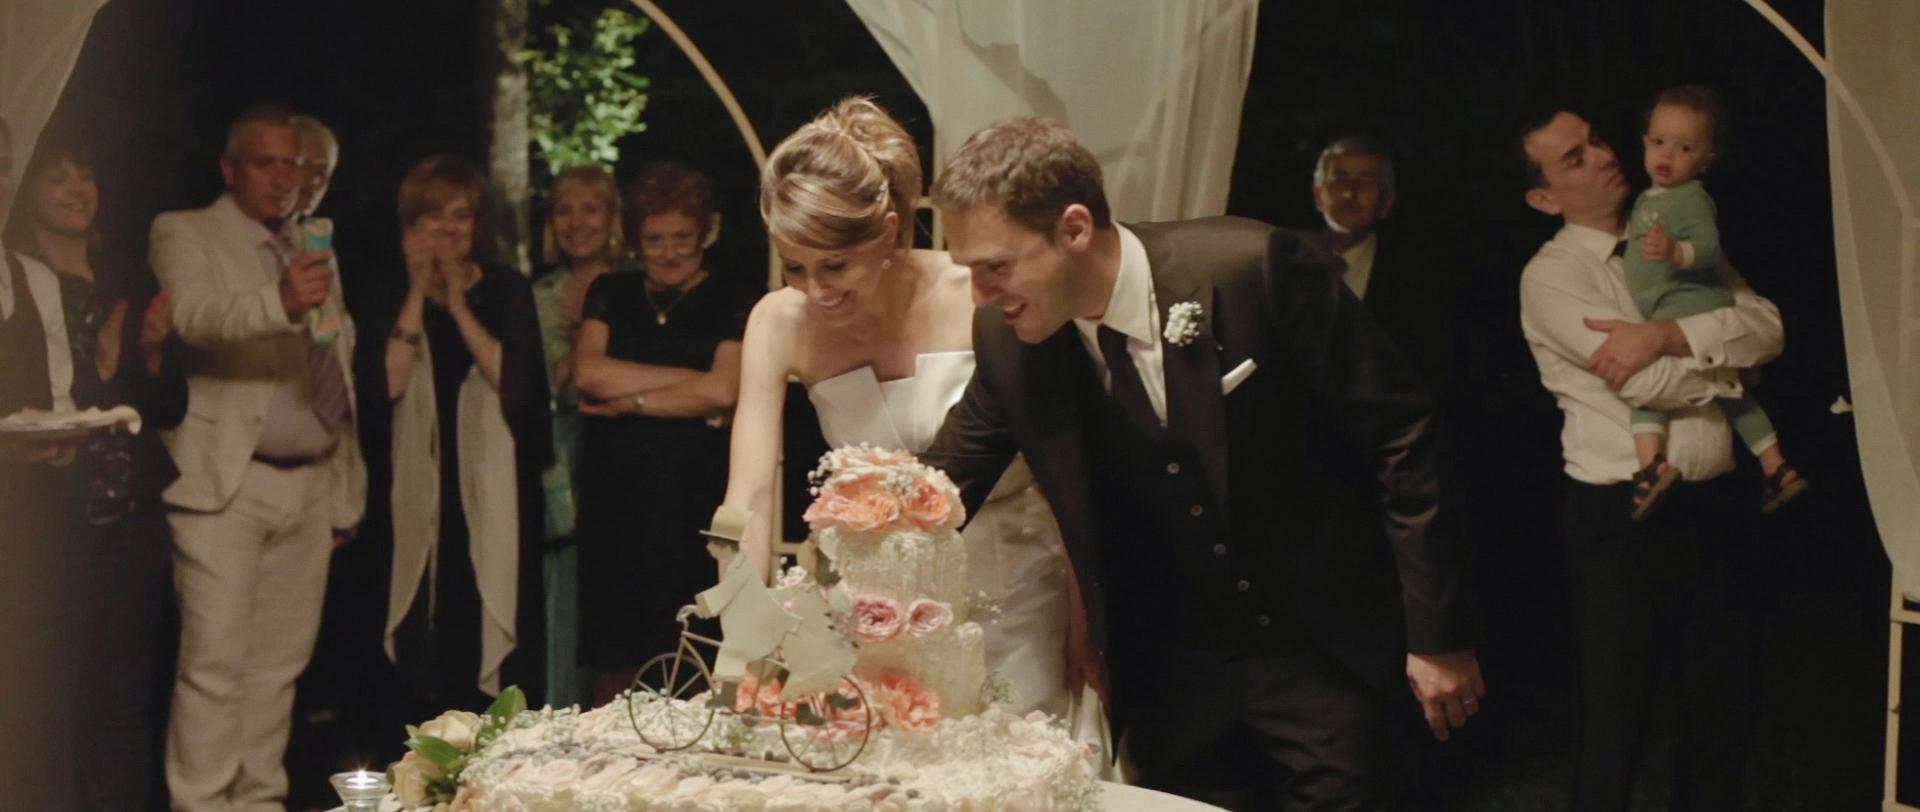 Frederic & Valentina | Trailer (Eng) 5